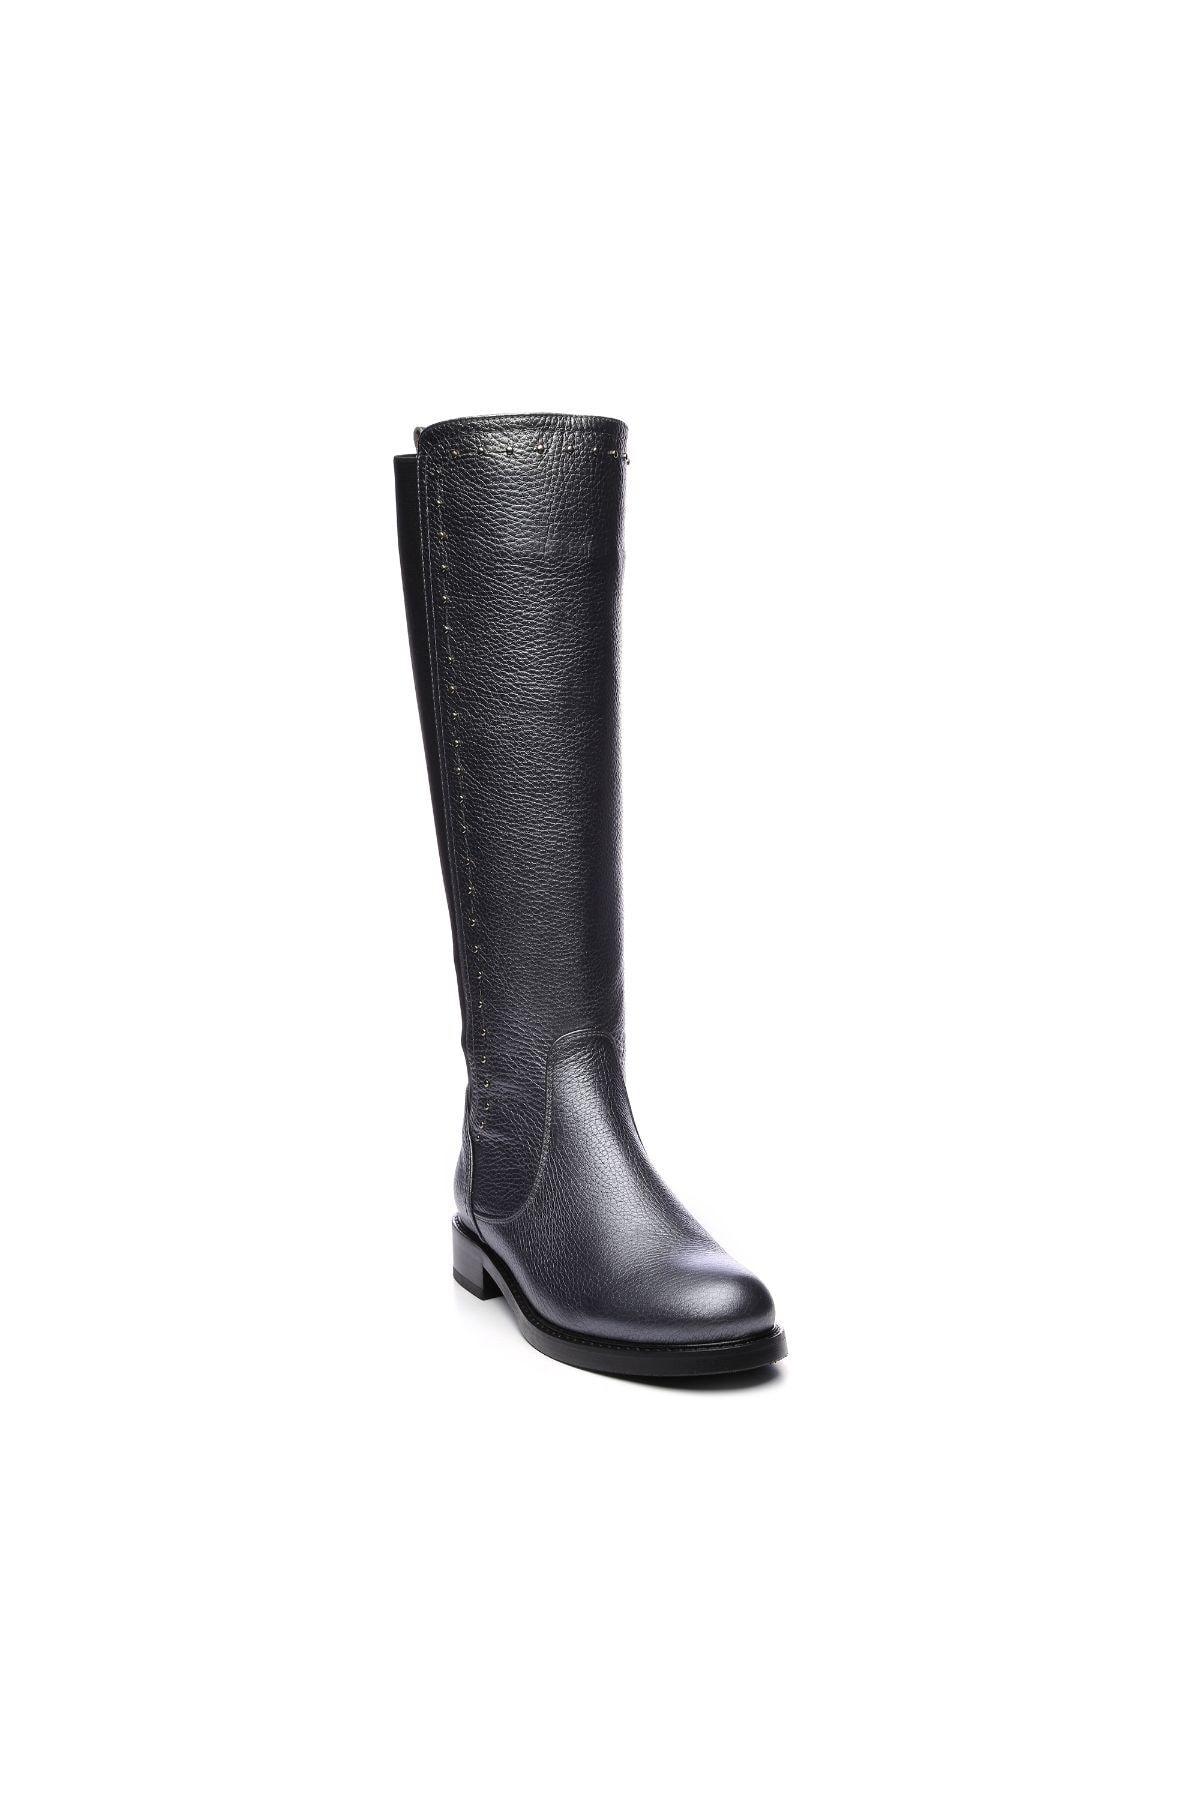 KEMAL TANCA Hakiki Deri Gri Kadın Çizme Çizme 94 6429 C BN CZM 2